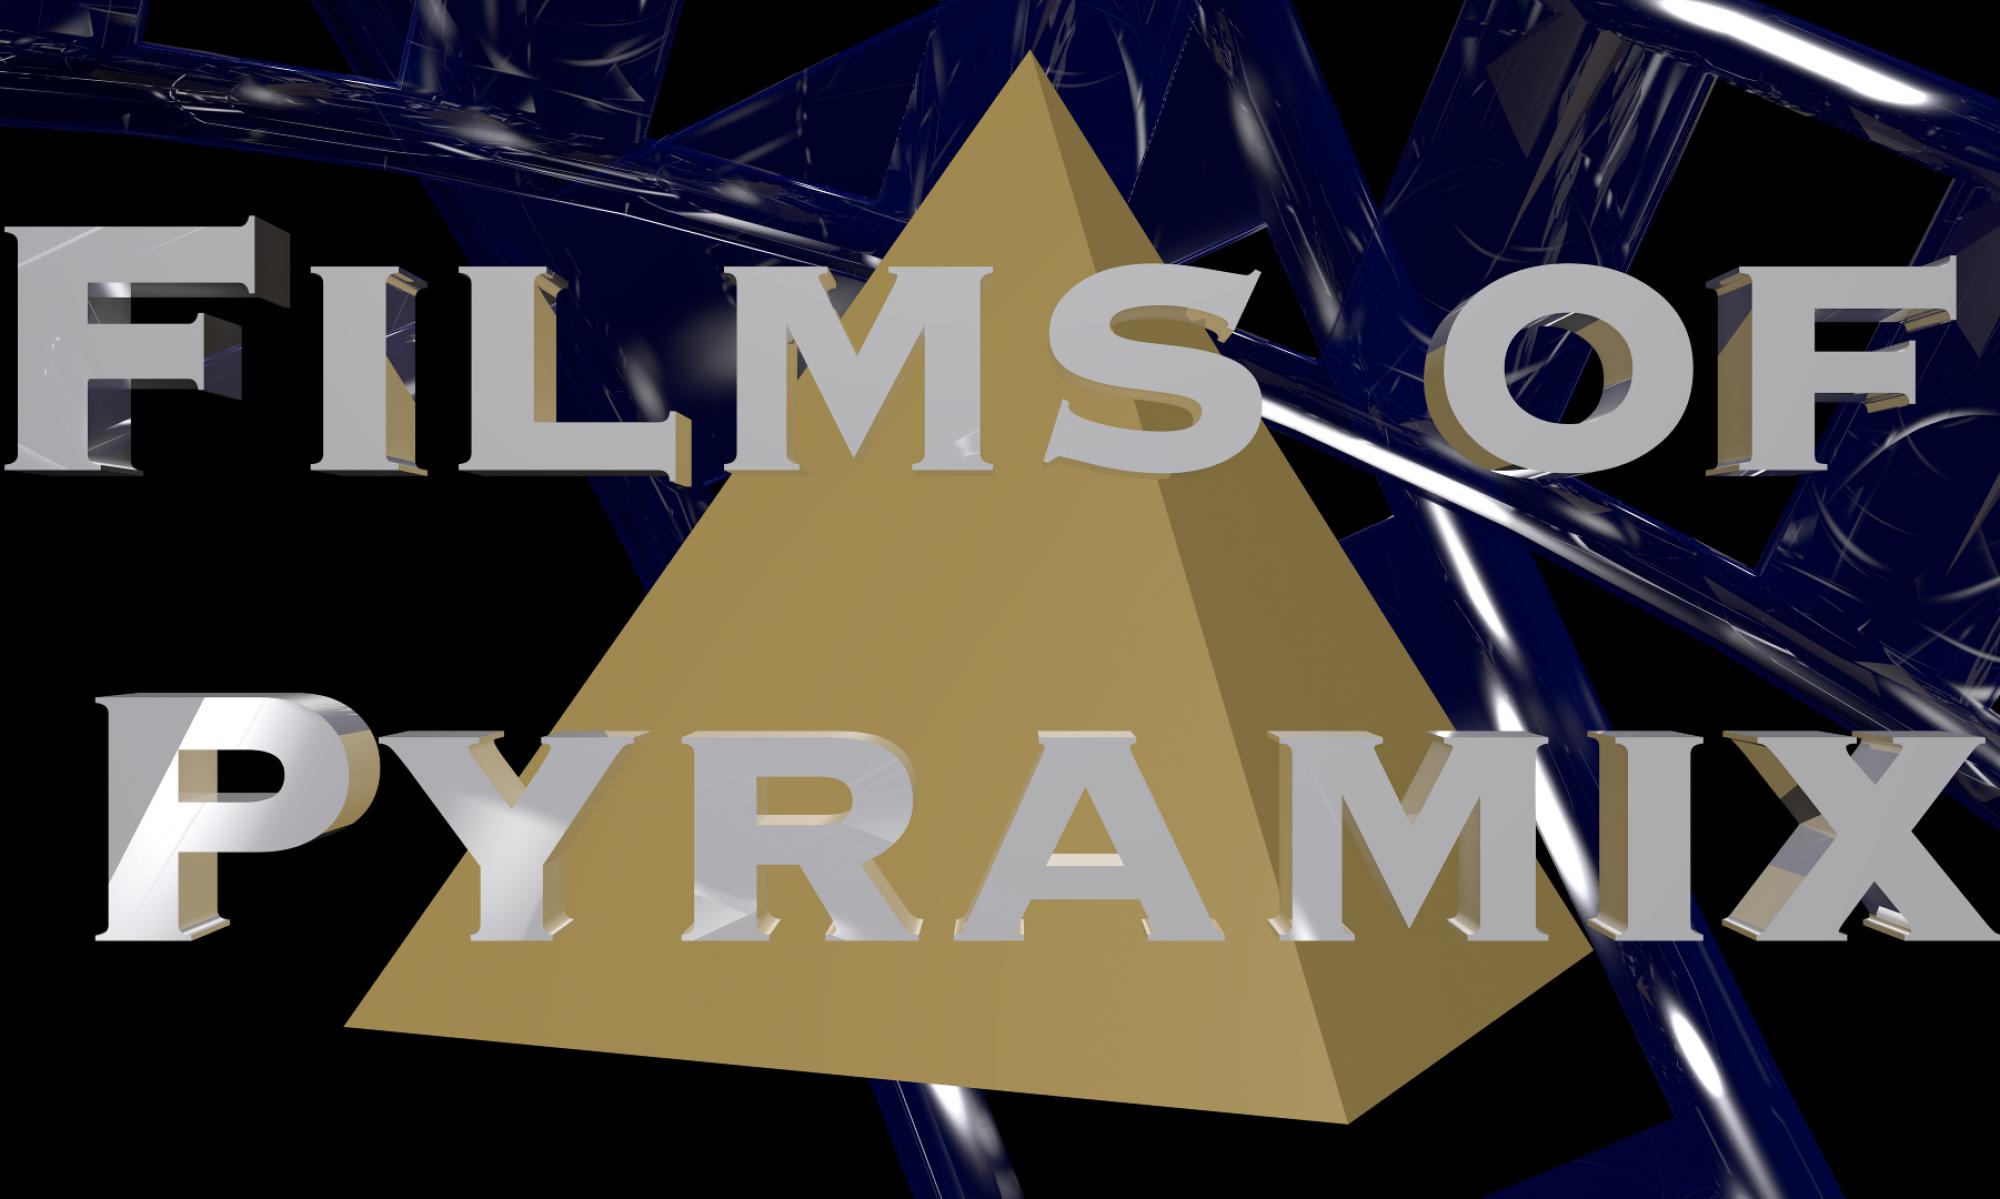 Films of Pyramix